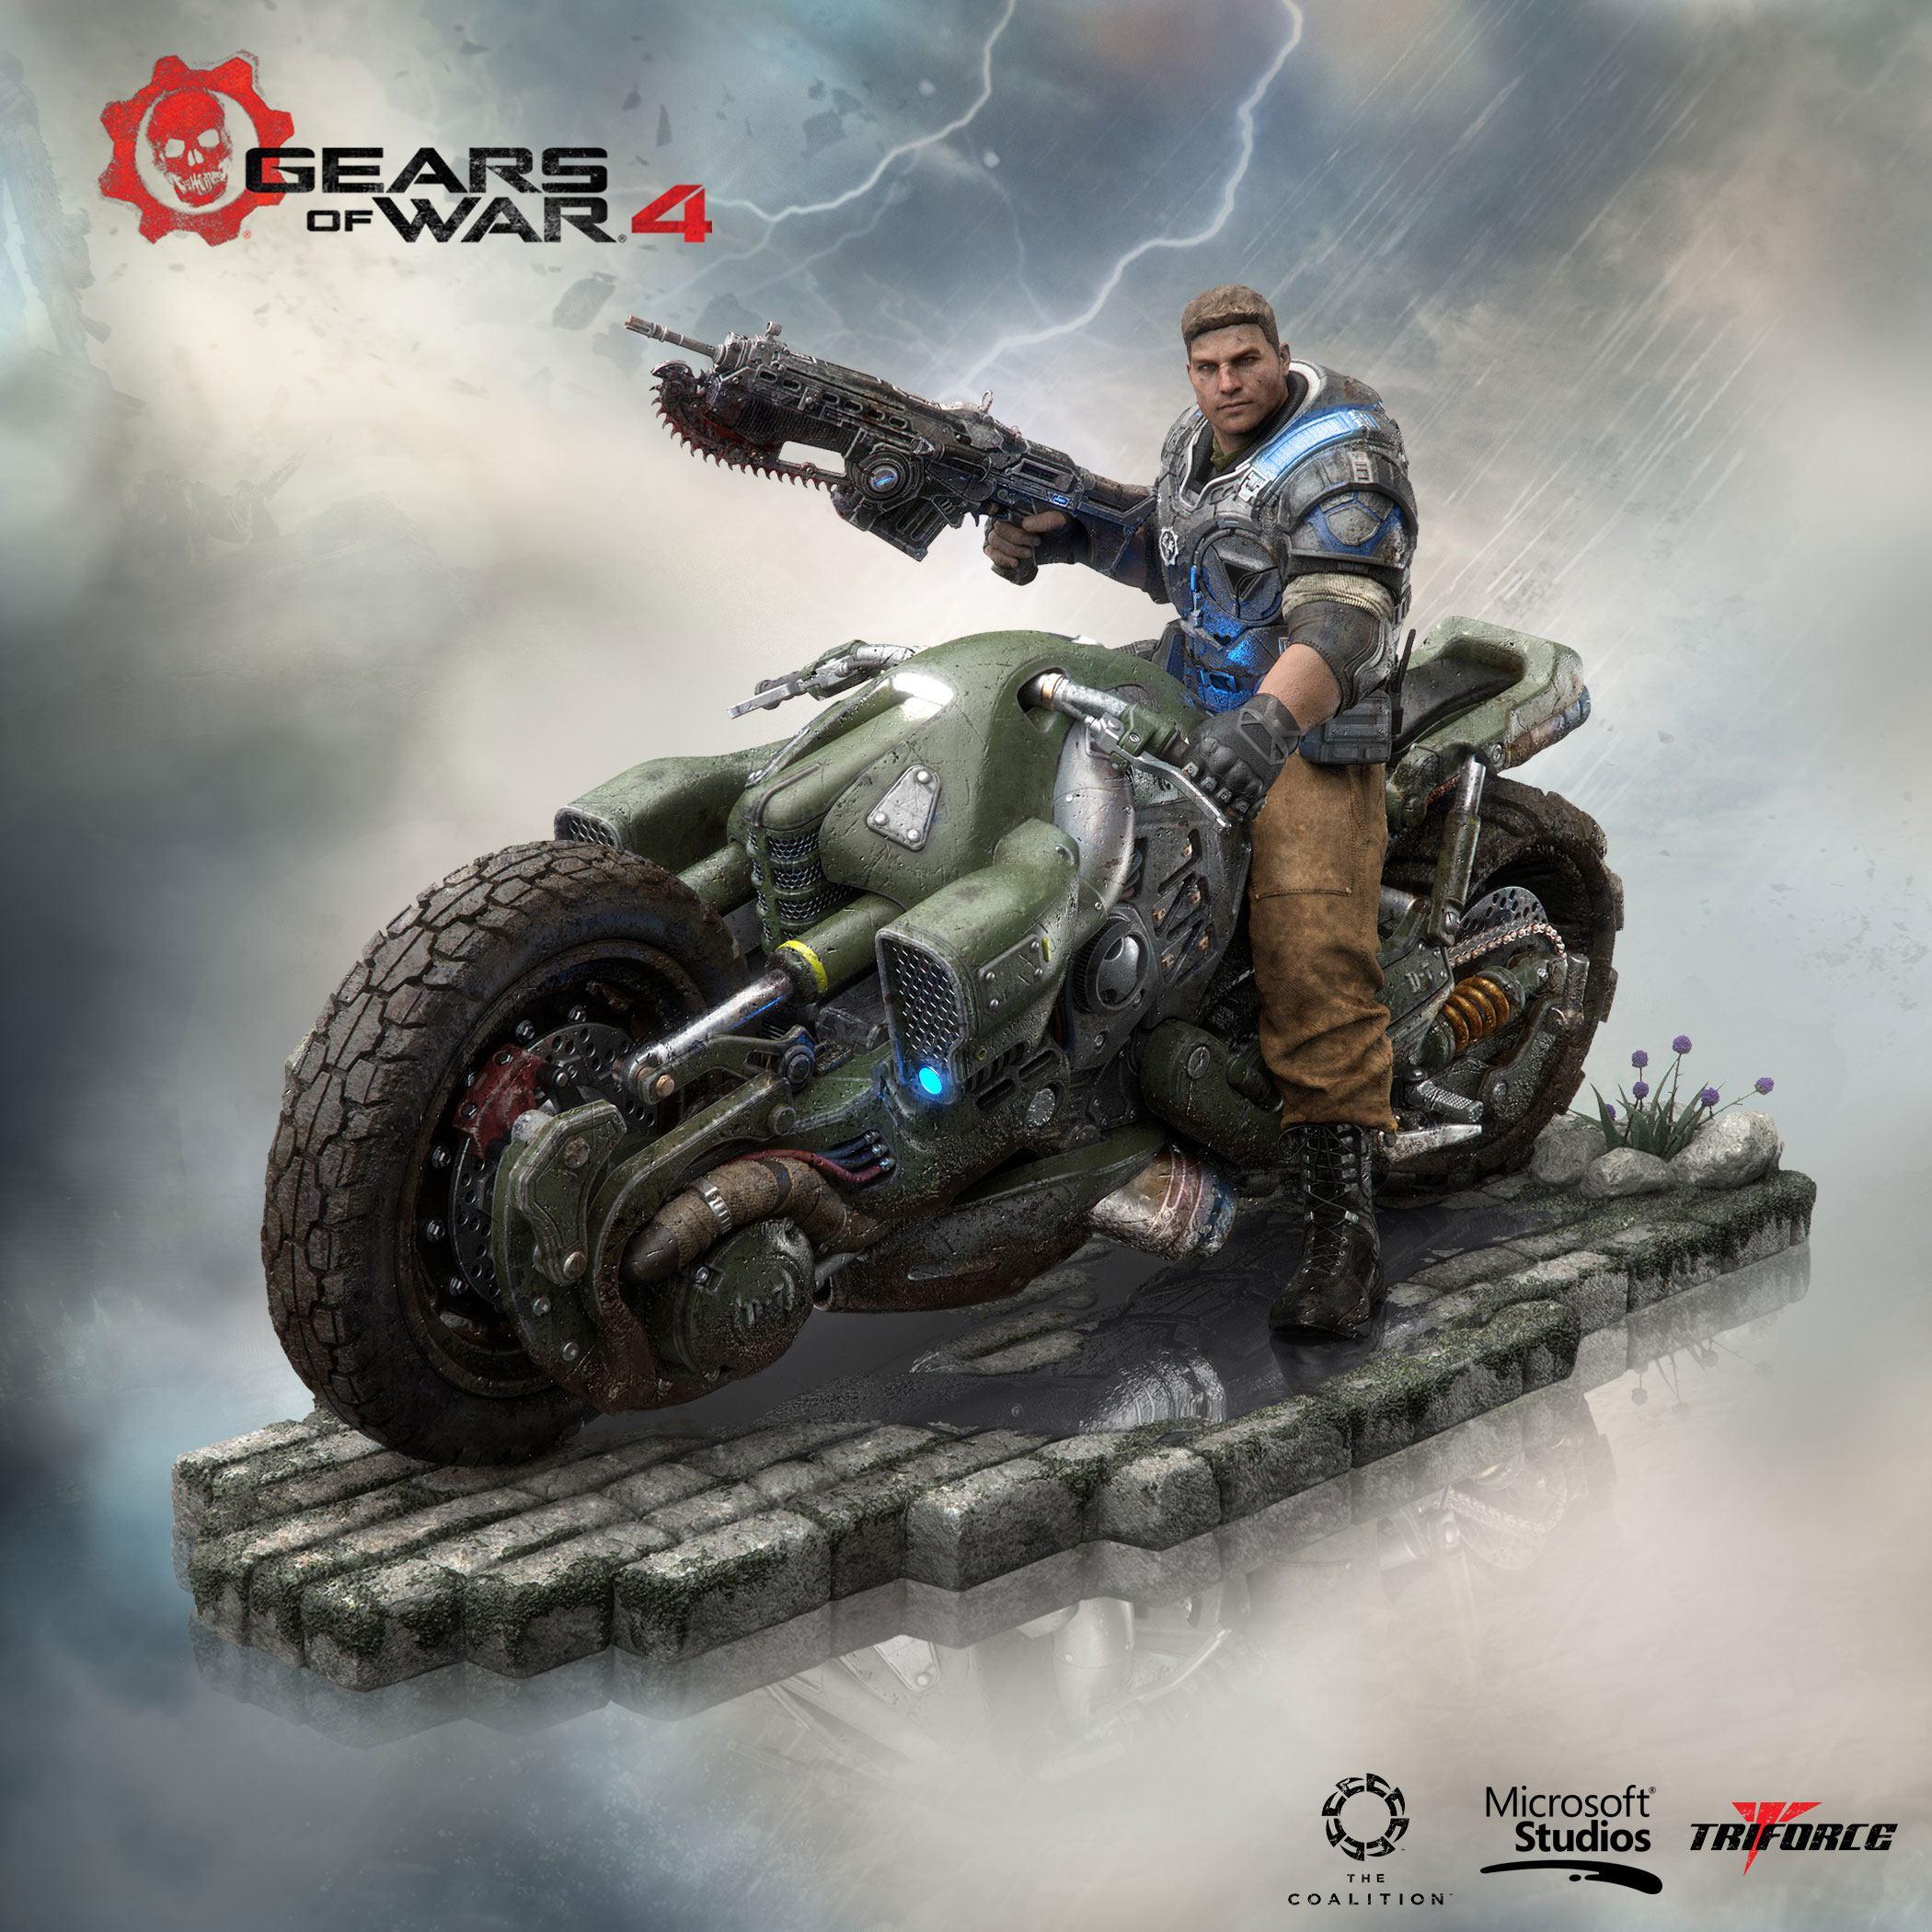 Gears of War 4 Collector's Edition PVC Statue JD Fenix 28 cm